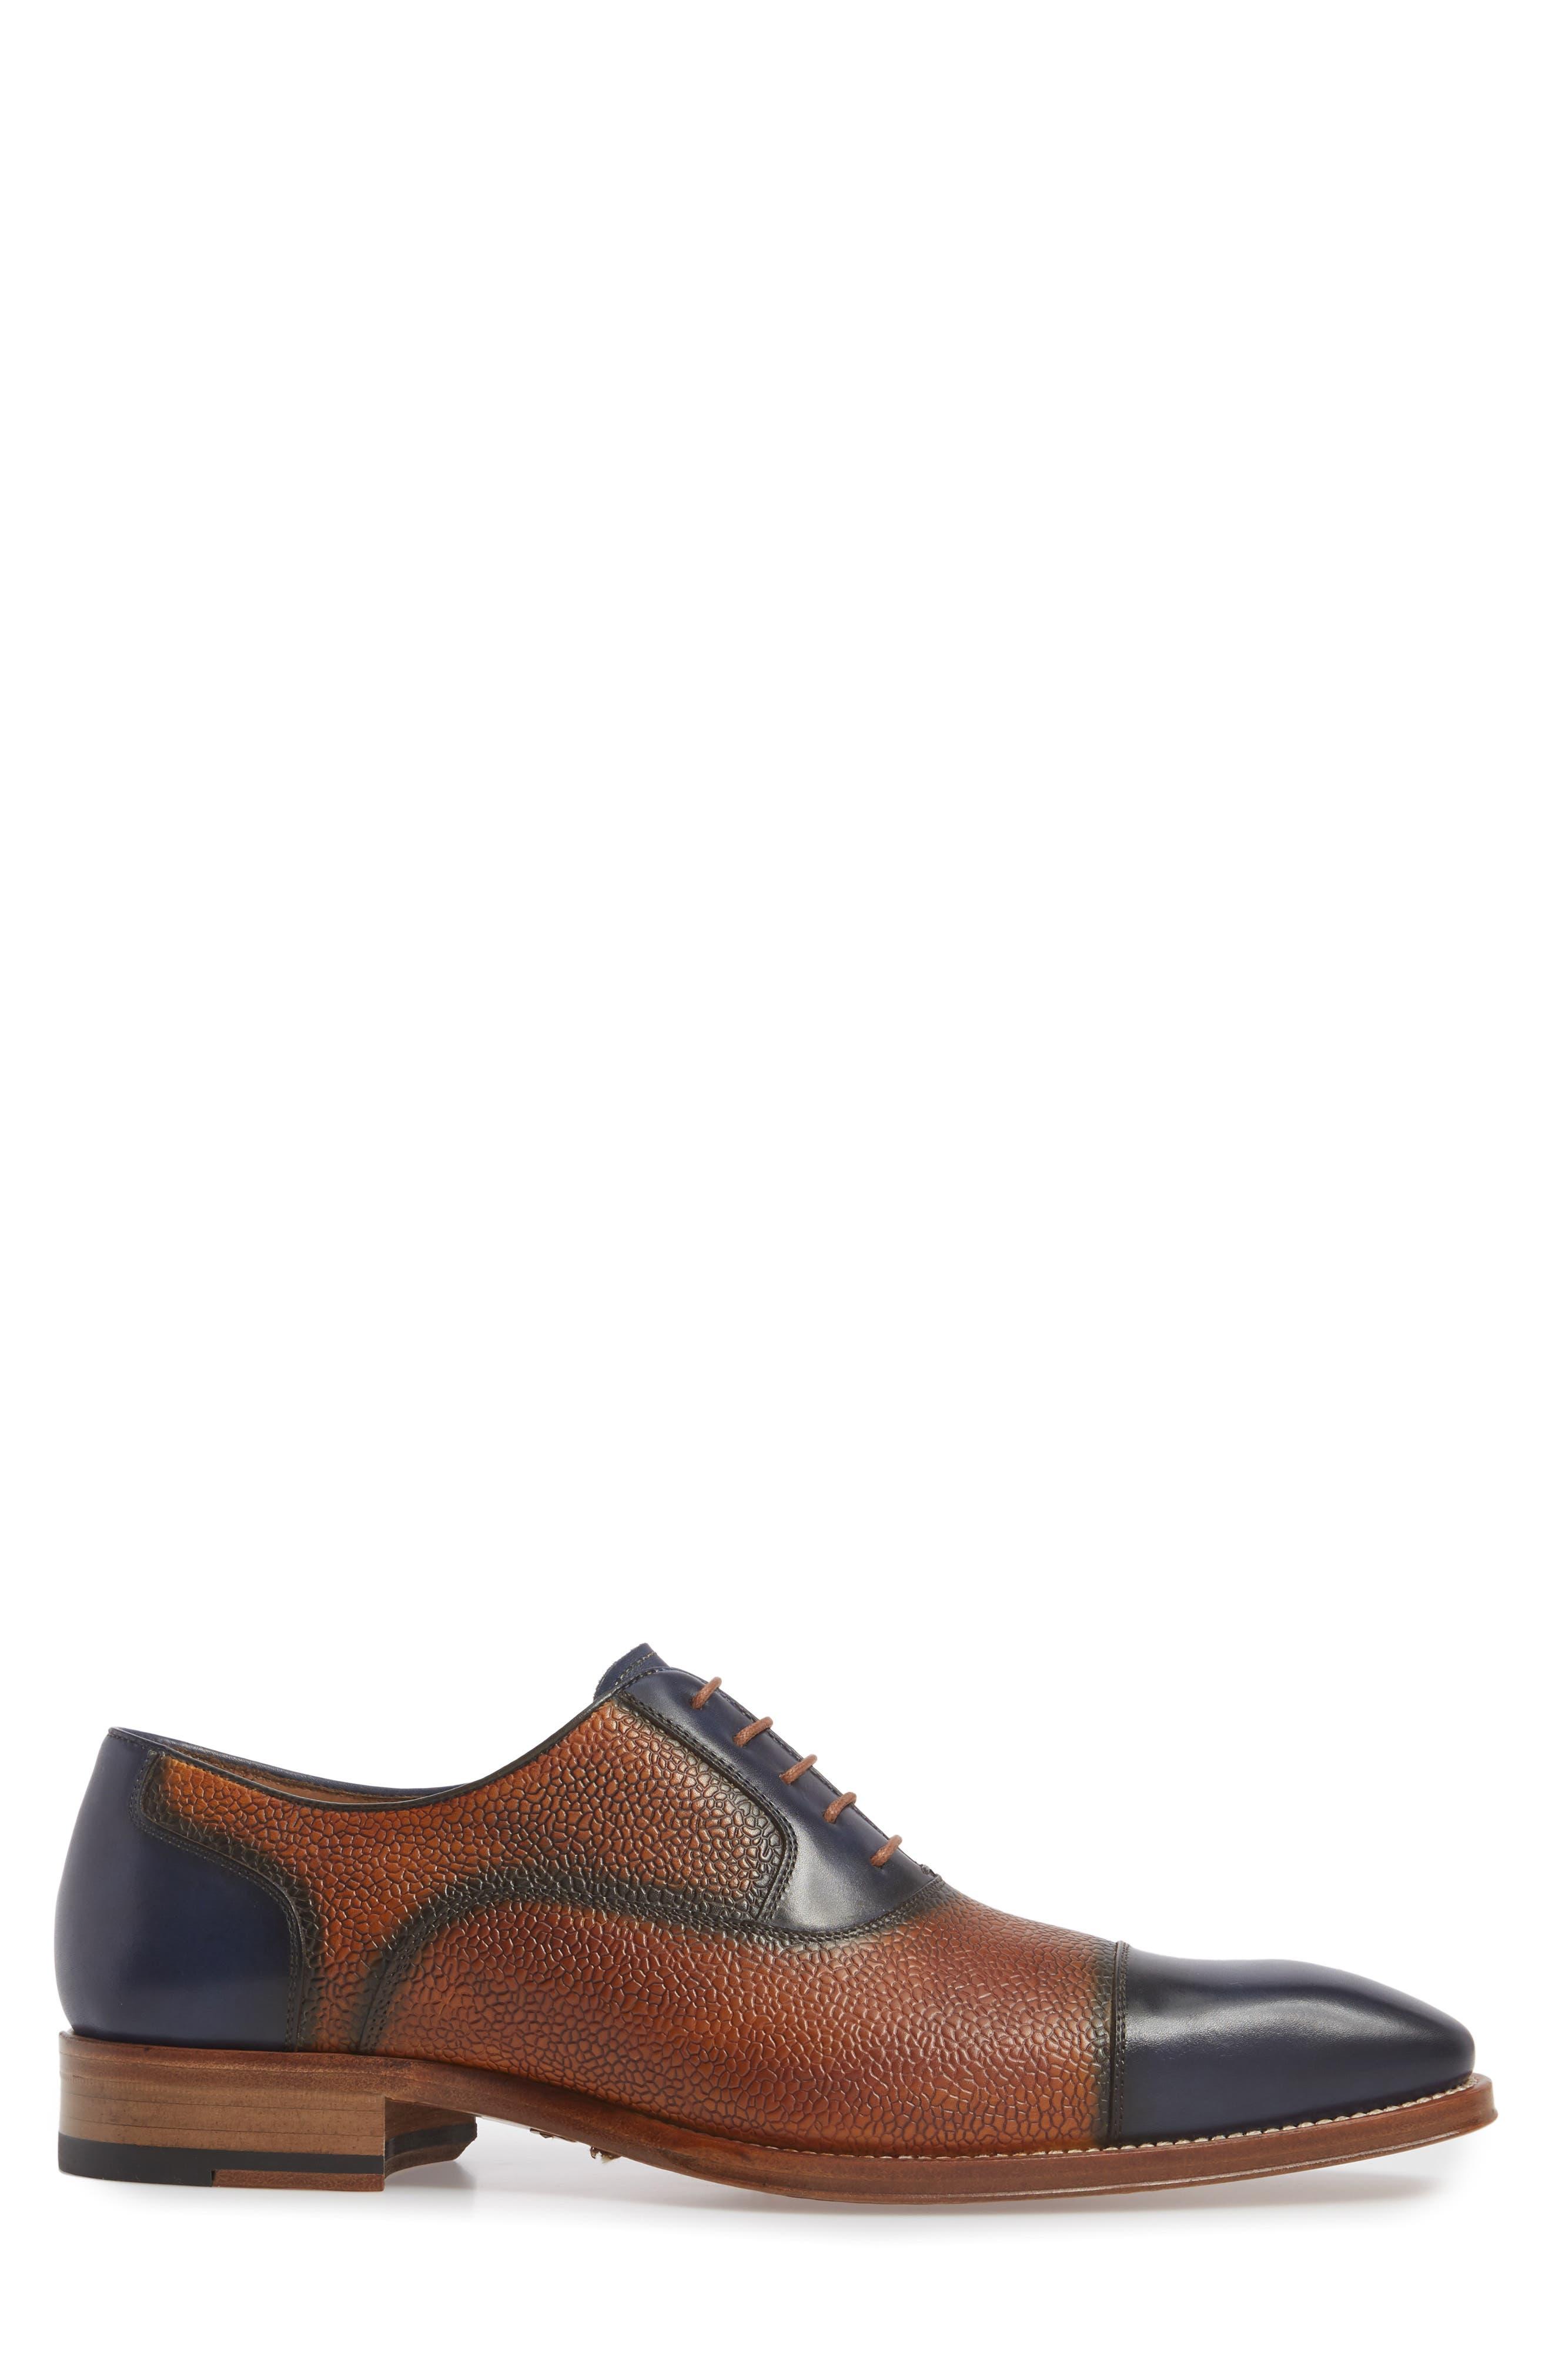 Verino Cap Toe Oxford,                             Alternate thumbnail 3, color,                             Blue/ Tan Leather